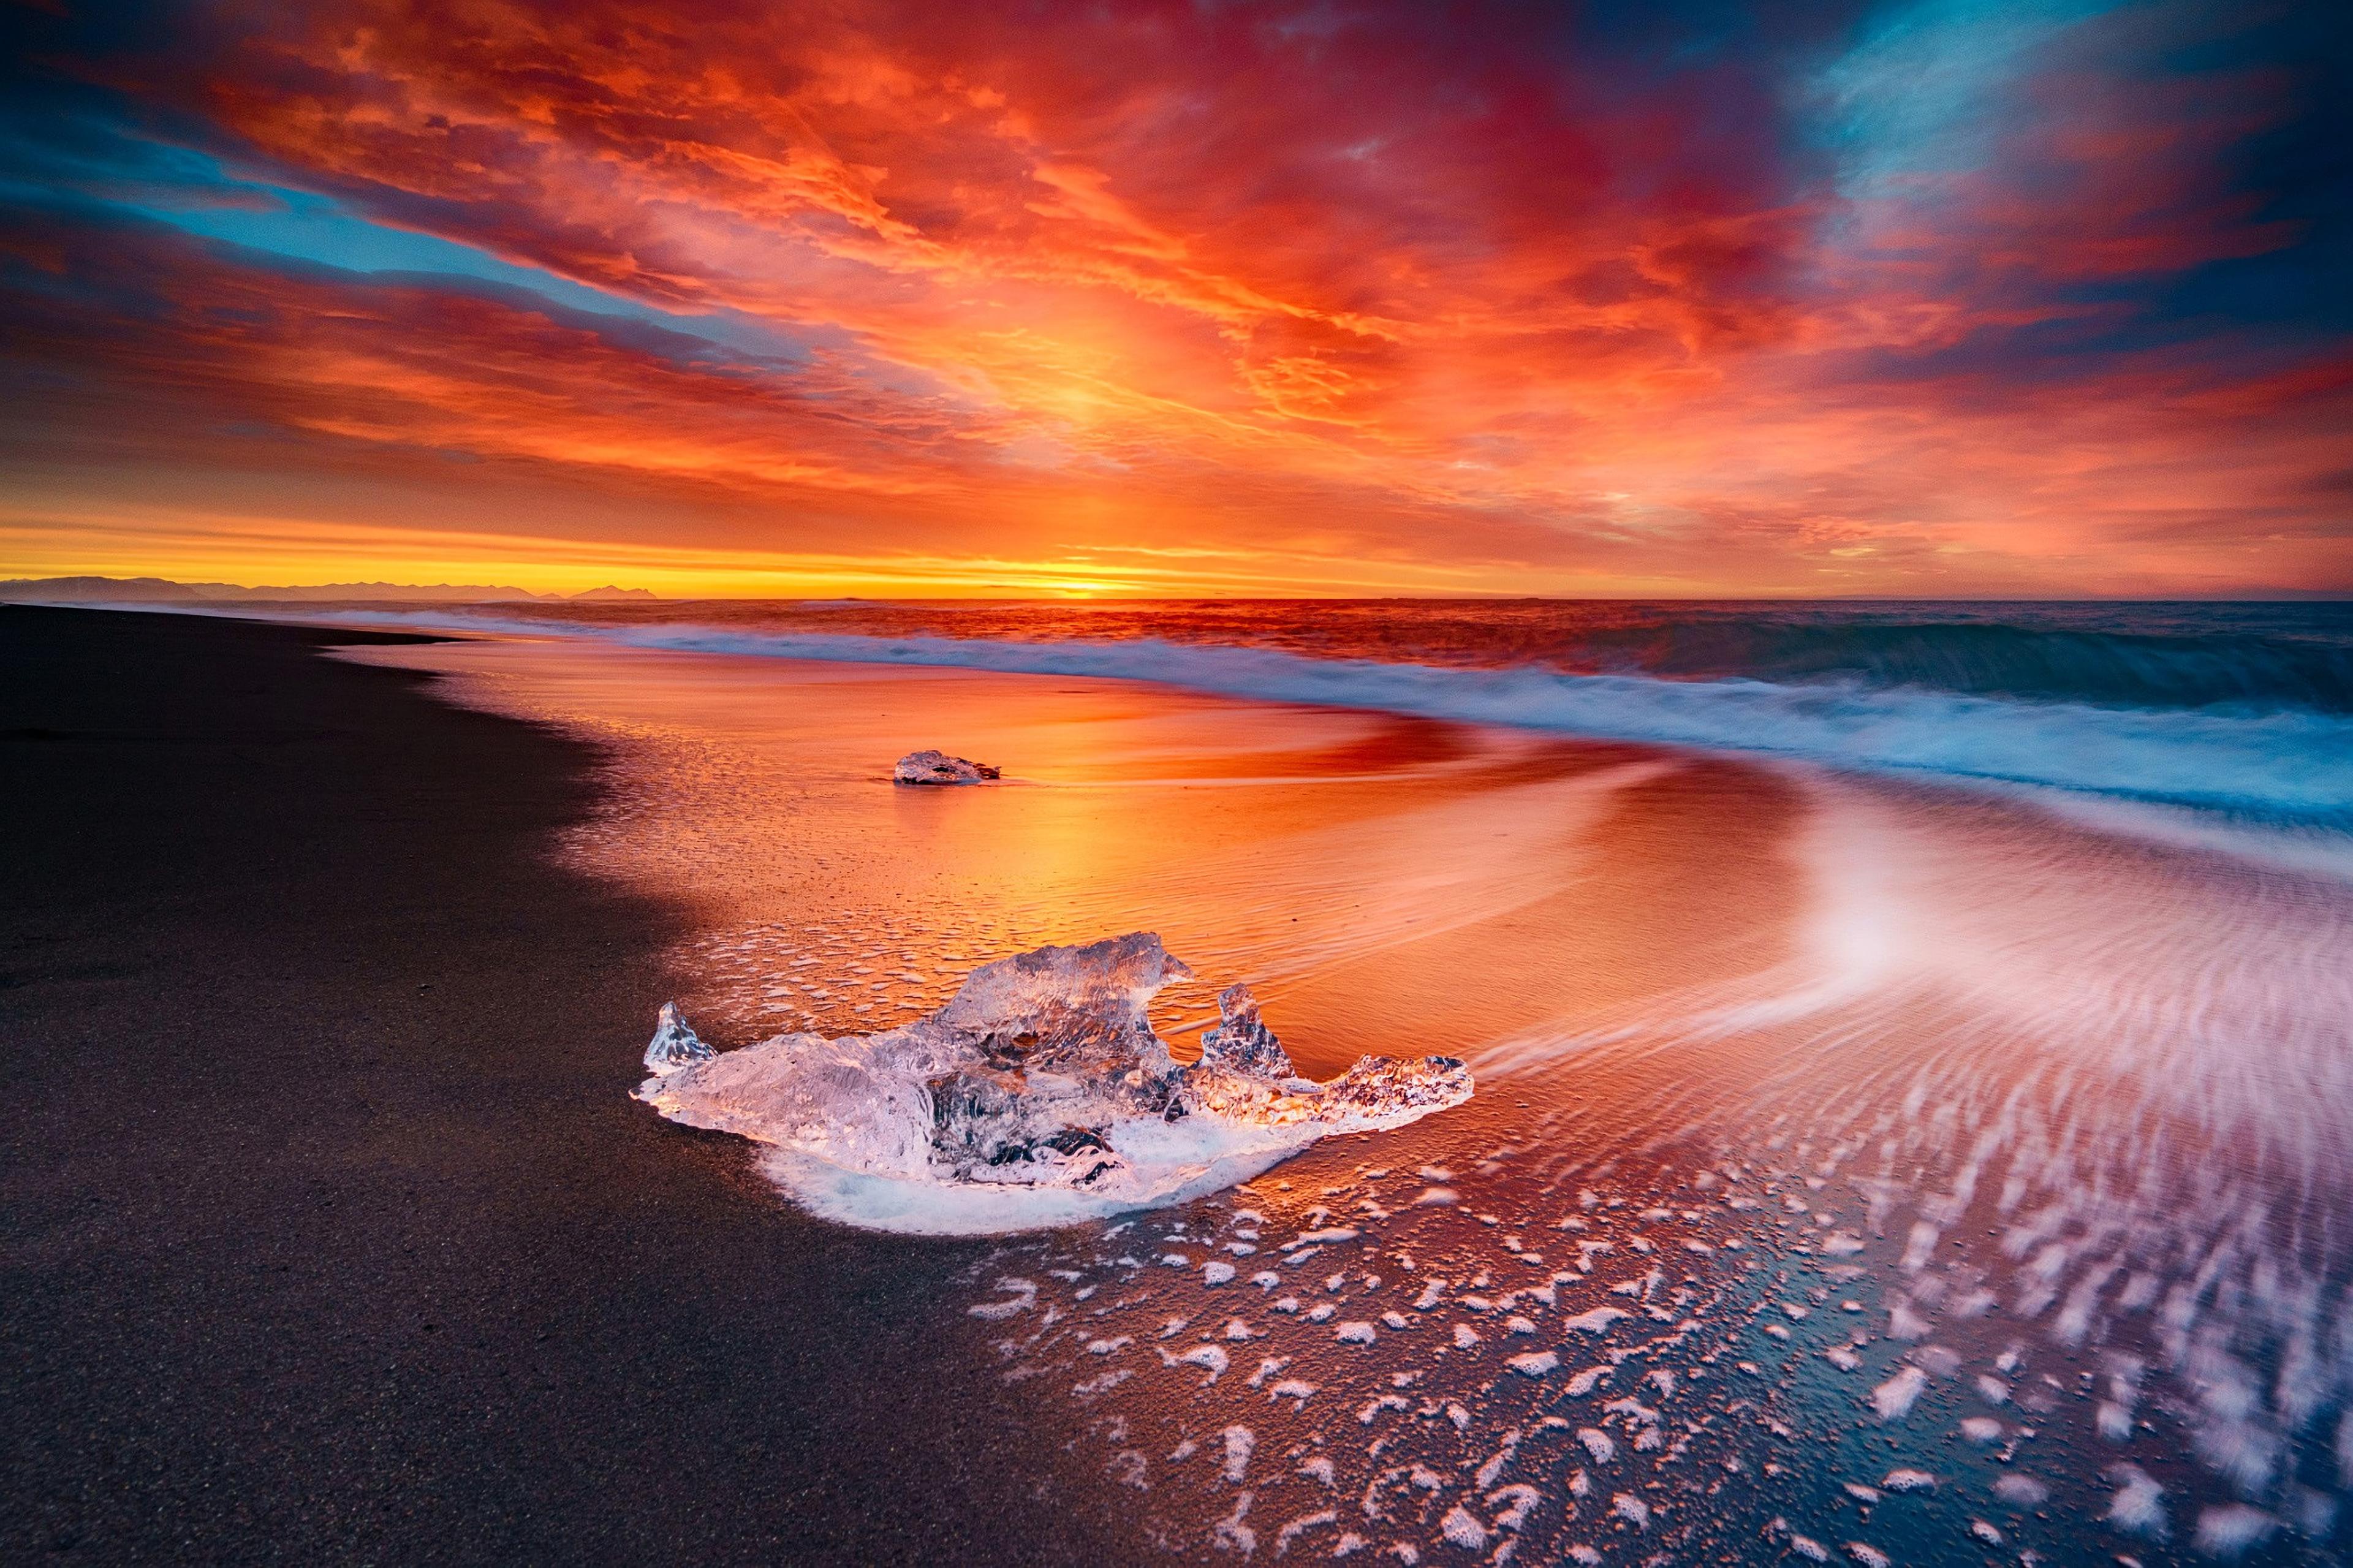 Waves Ocean Long Exposure 4k, HD Nature, 4k Wallpapers ...